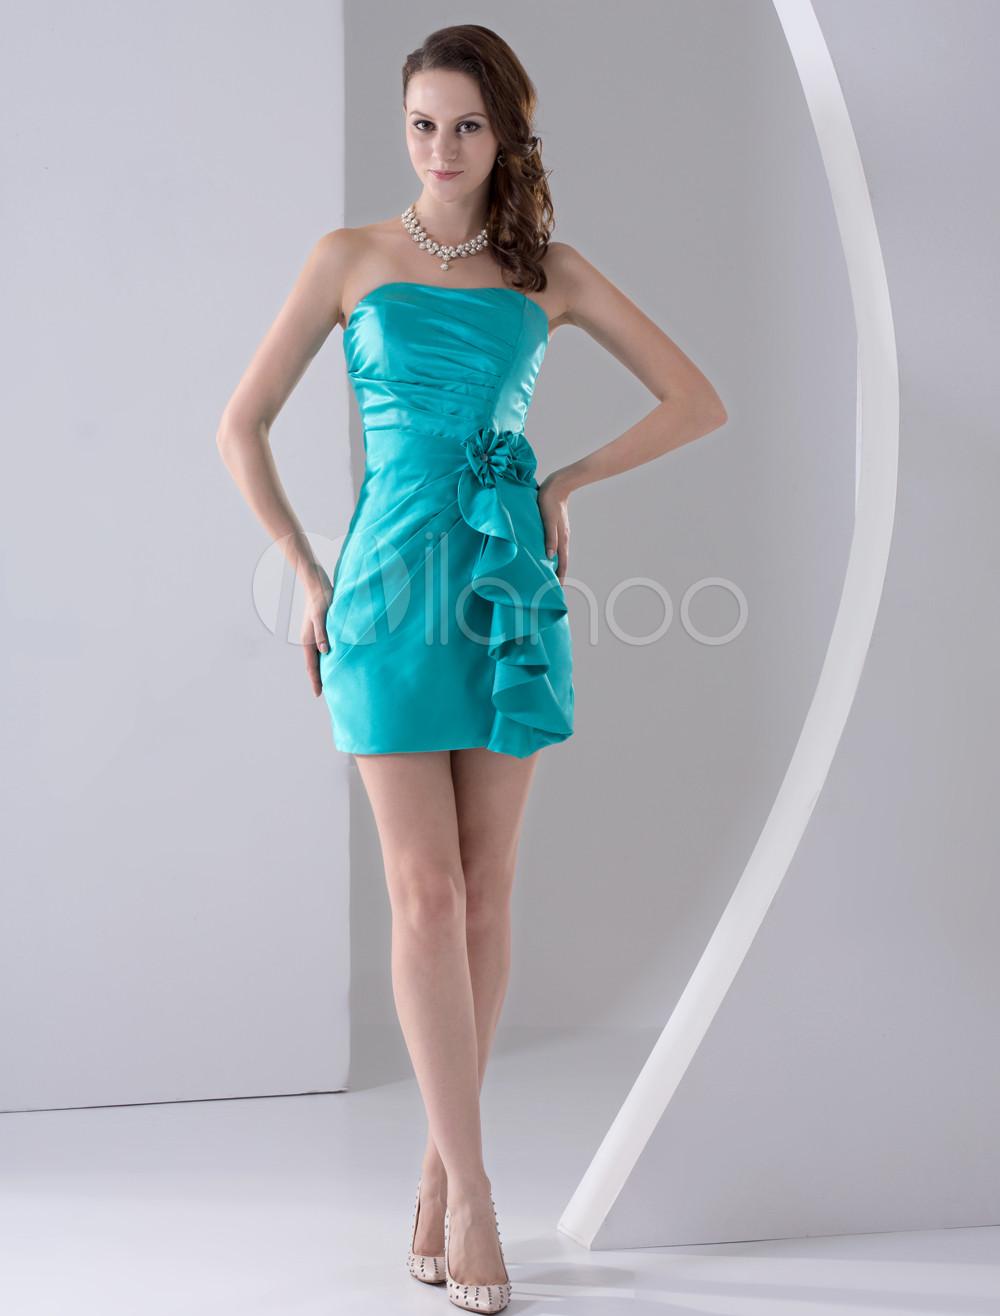 Army Green Mini Length Strapless Elastic Woven Satin Bridesmaid Dress